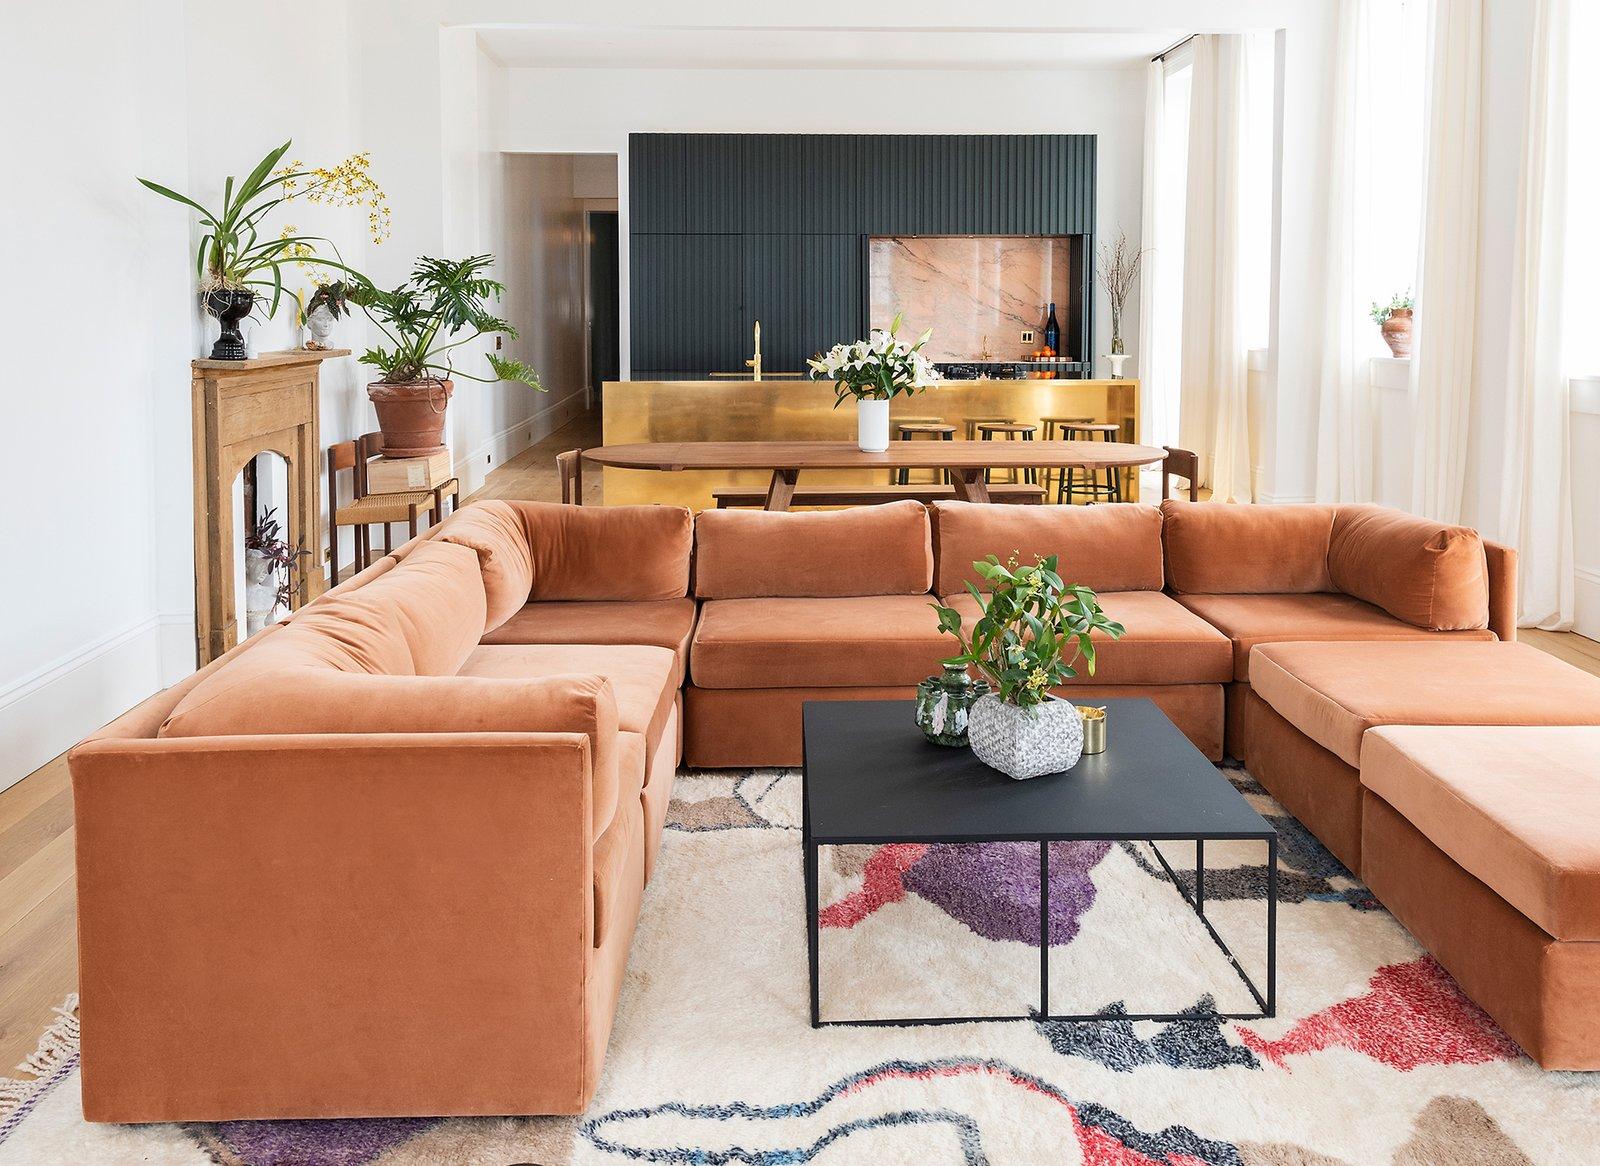 KREWE HQ by KREWE and Olivia Erwin Interiors